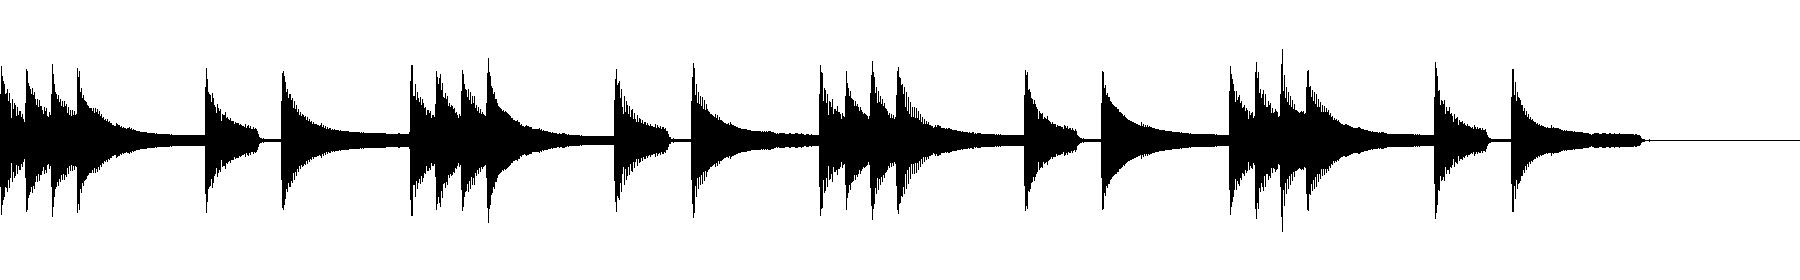 posty bassline